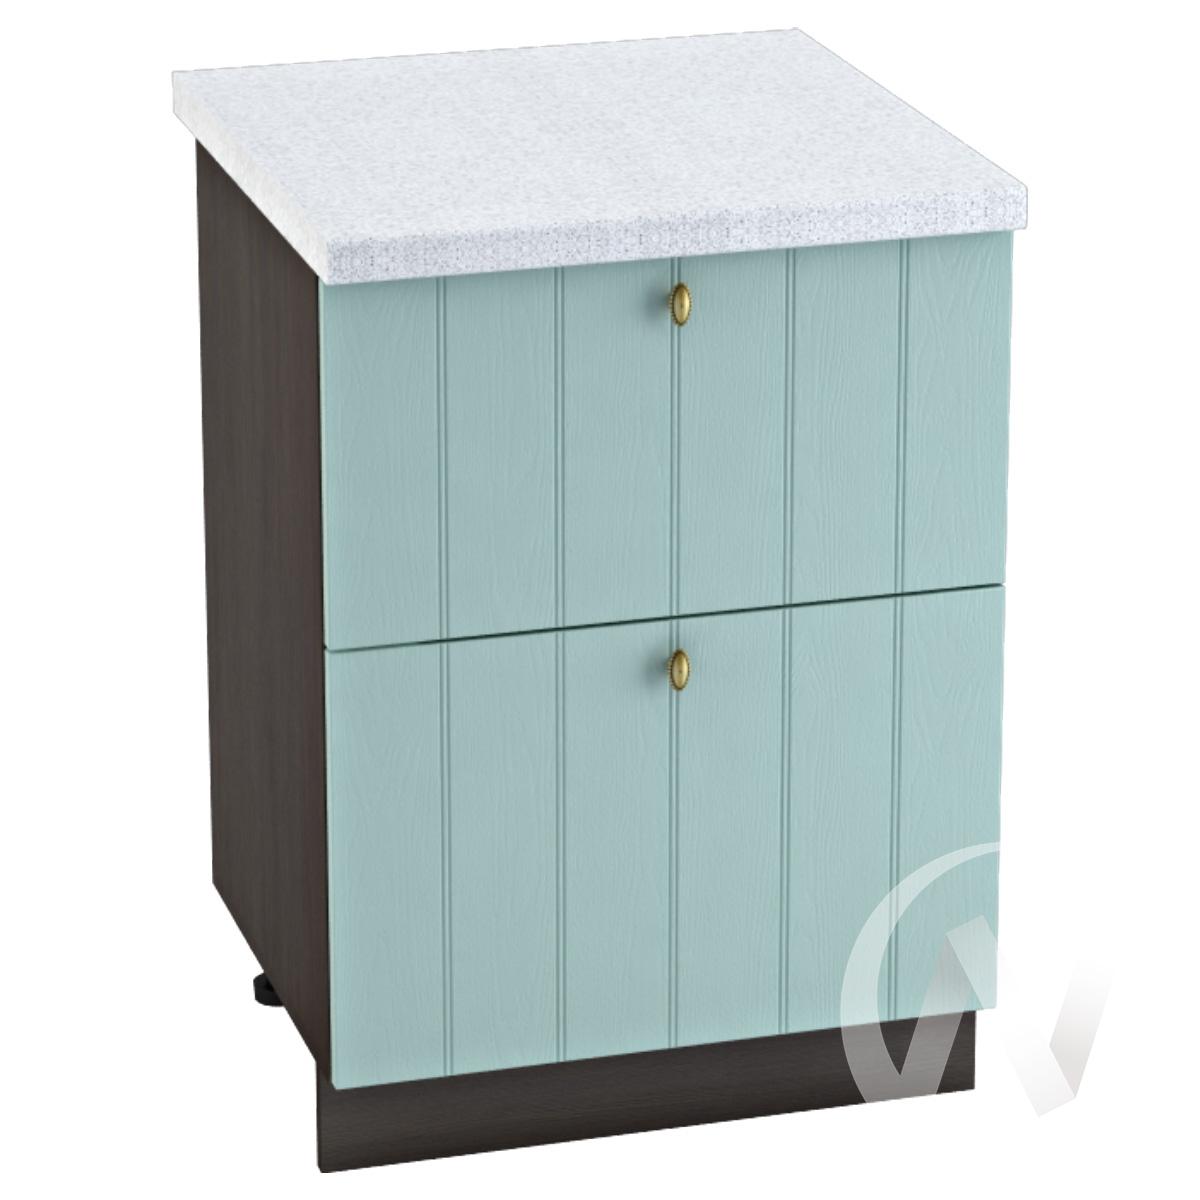 "Кухня ""Прованс"": Шкаф нижний с 2-мя ящиками 600, ШН2Я 600 (голубой/корпус венге)"